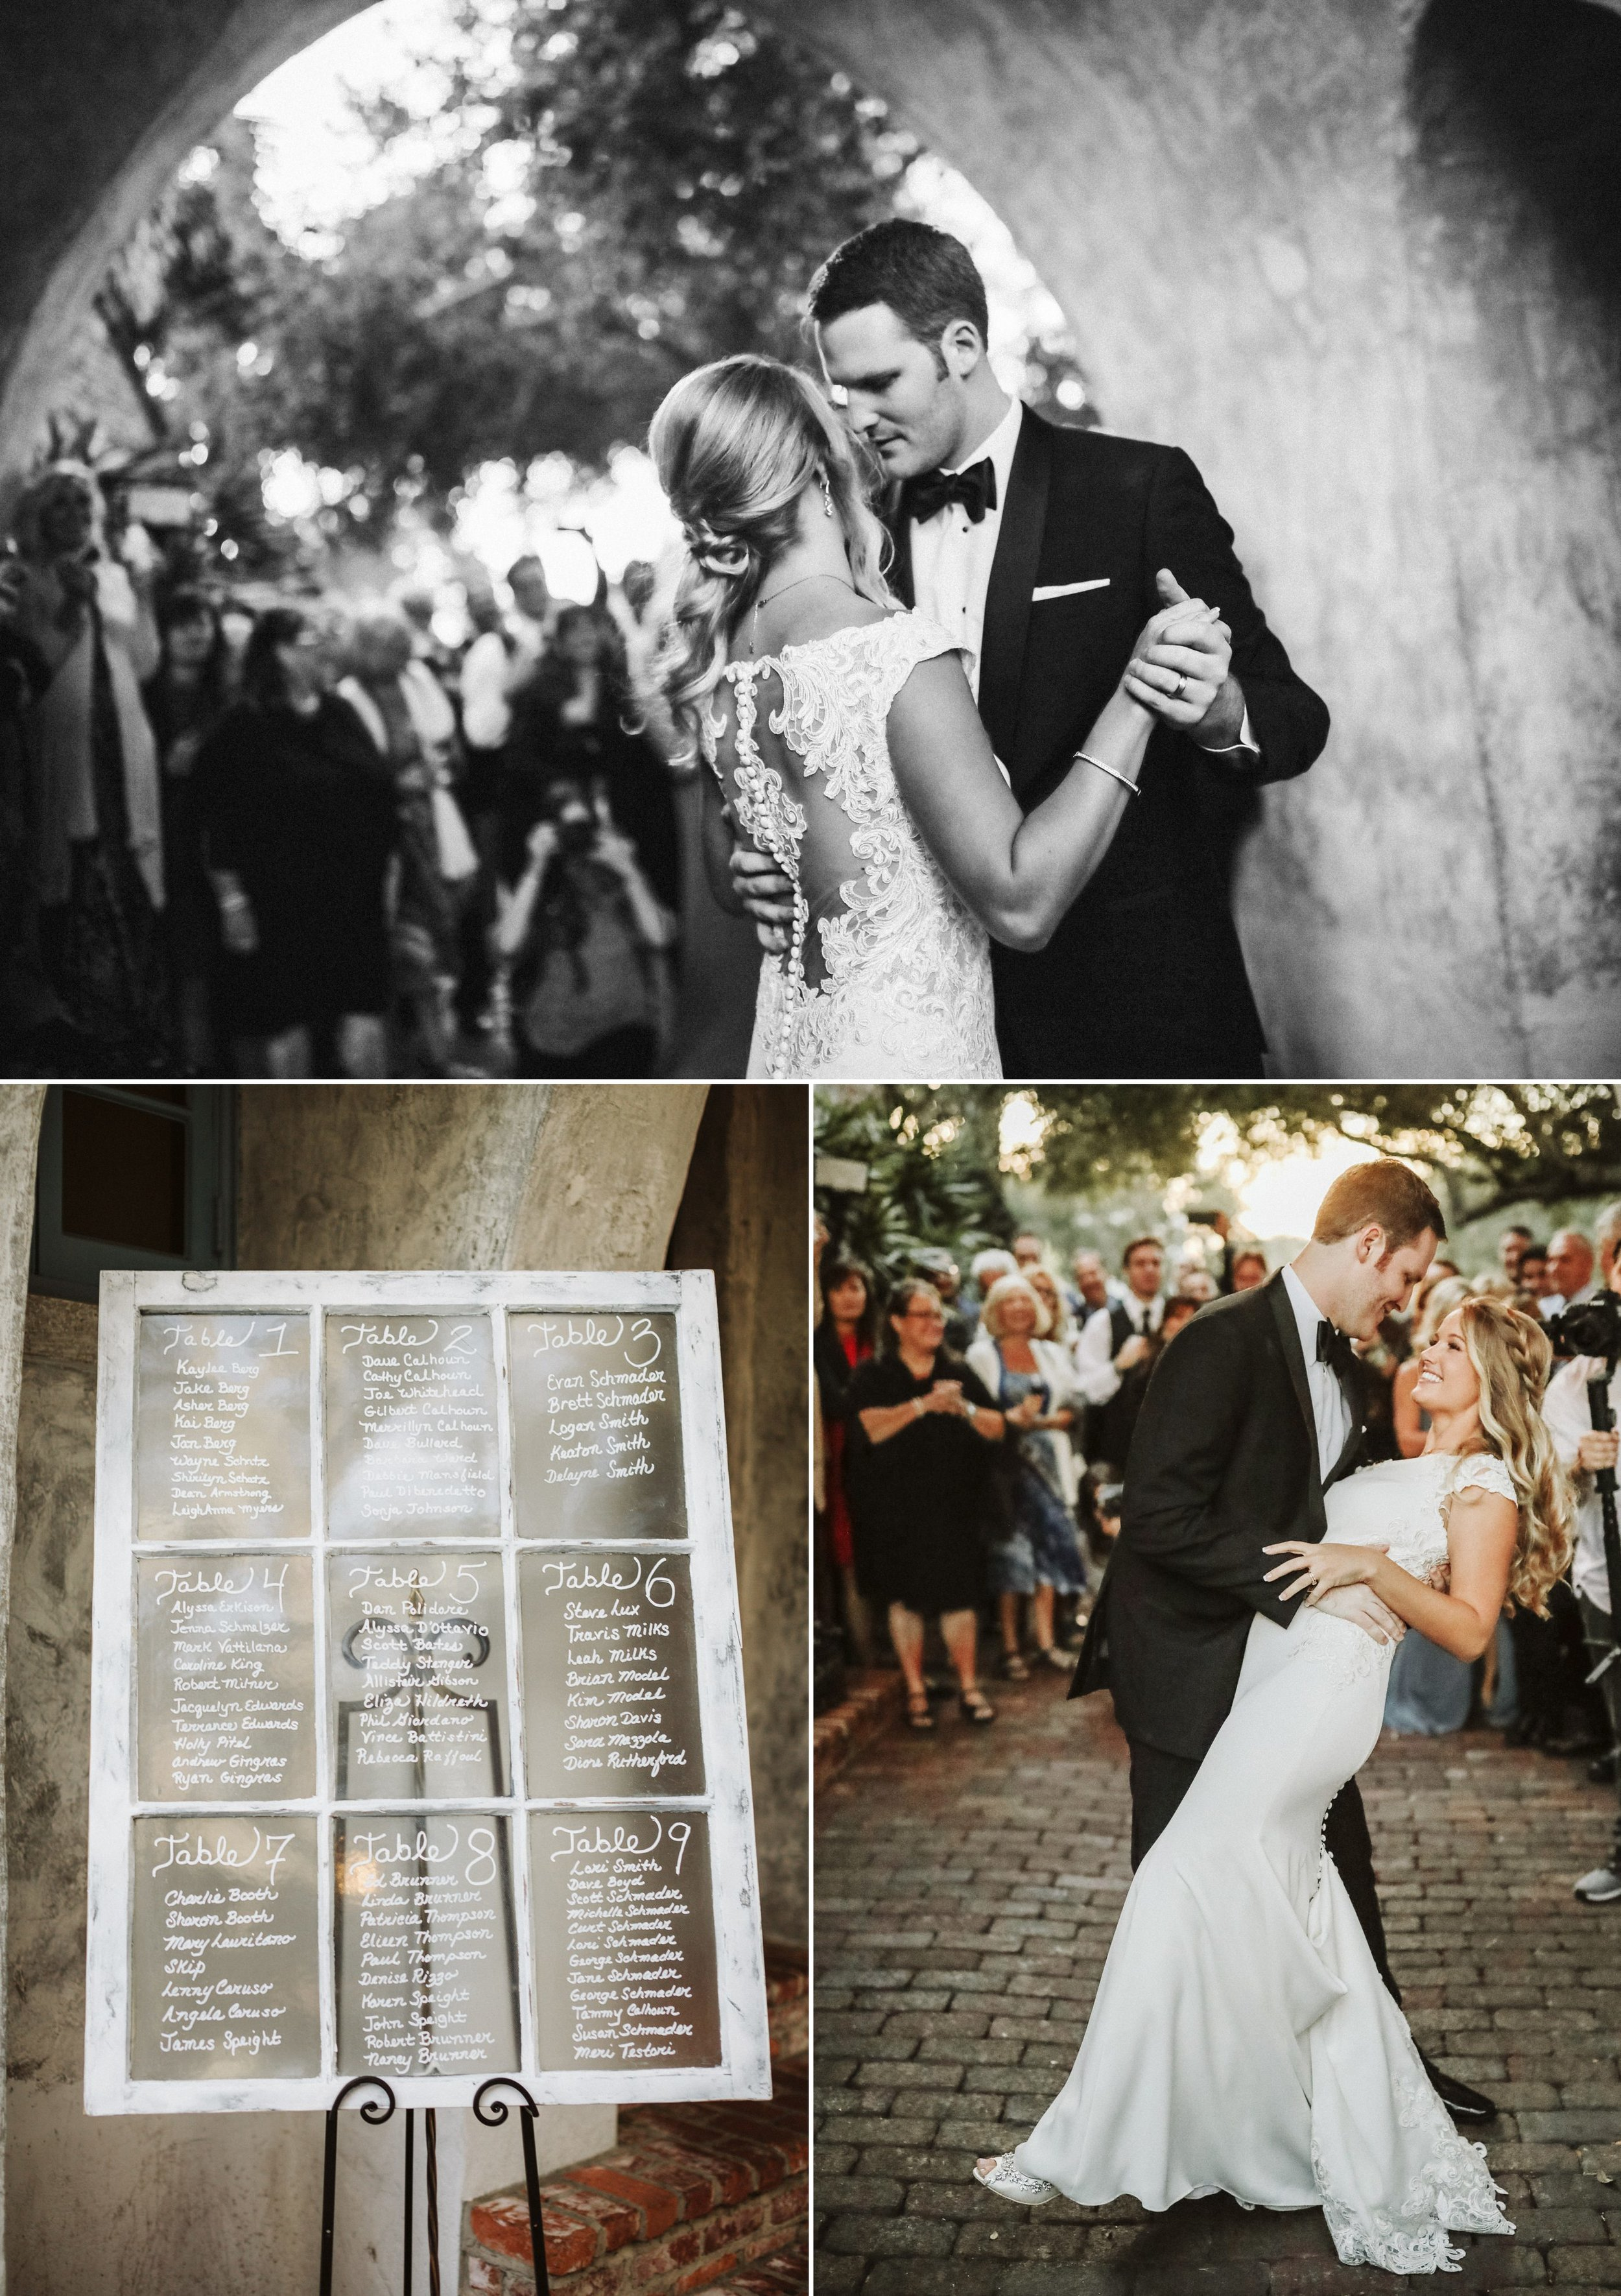 Casa Feliz Romantic Black Tie Wedding- Nick + Marissa- by Shaina DeCiryan Photography8.jpg